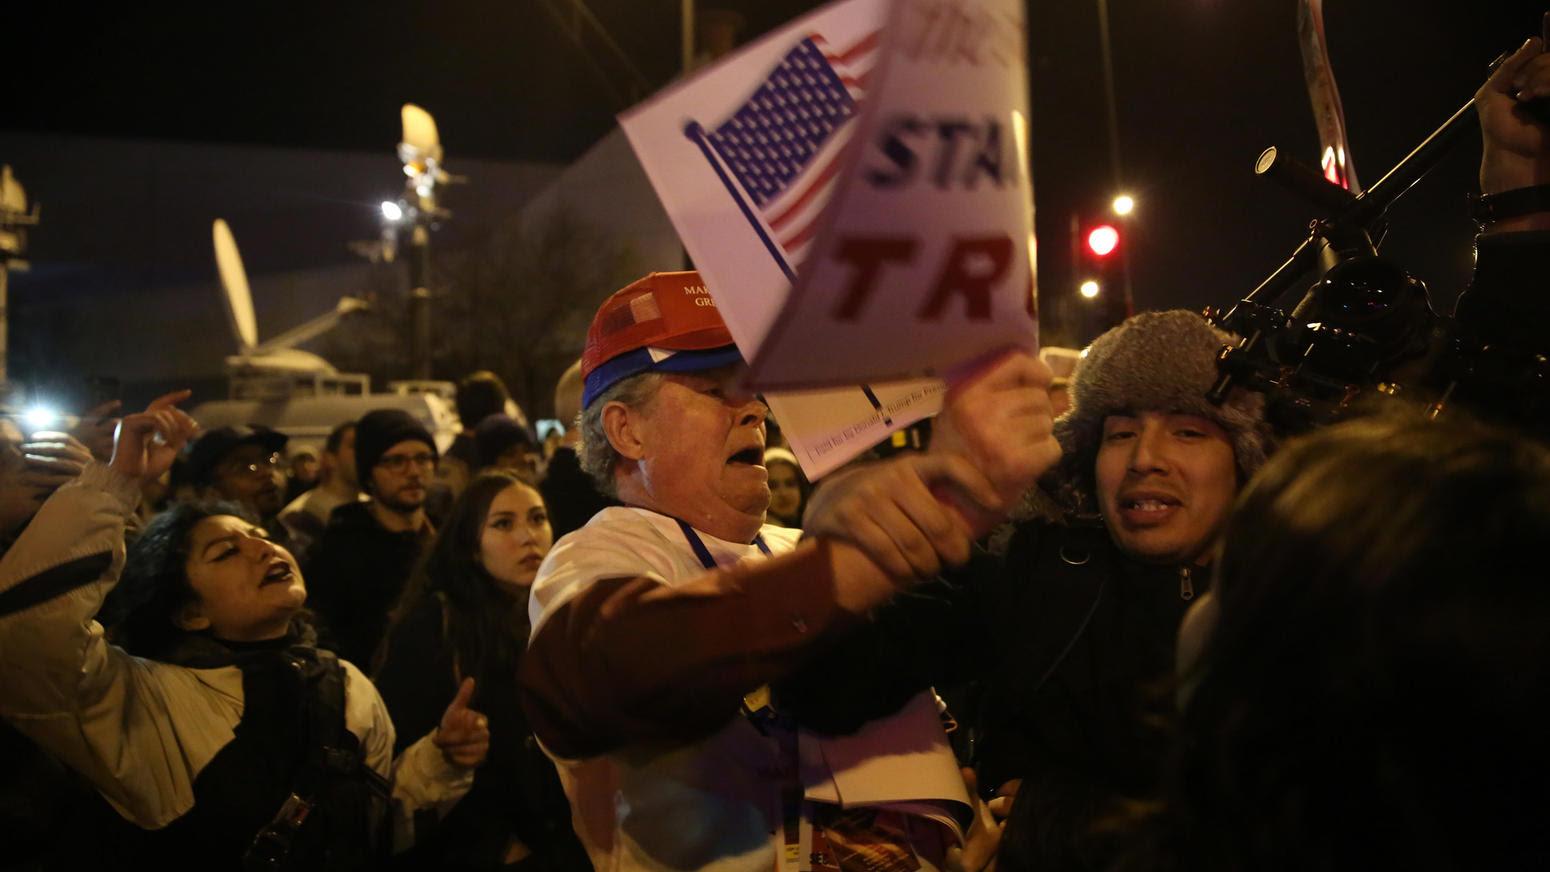 A protester celebrates